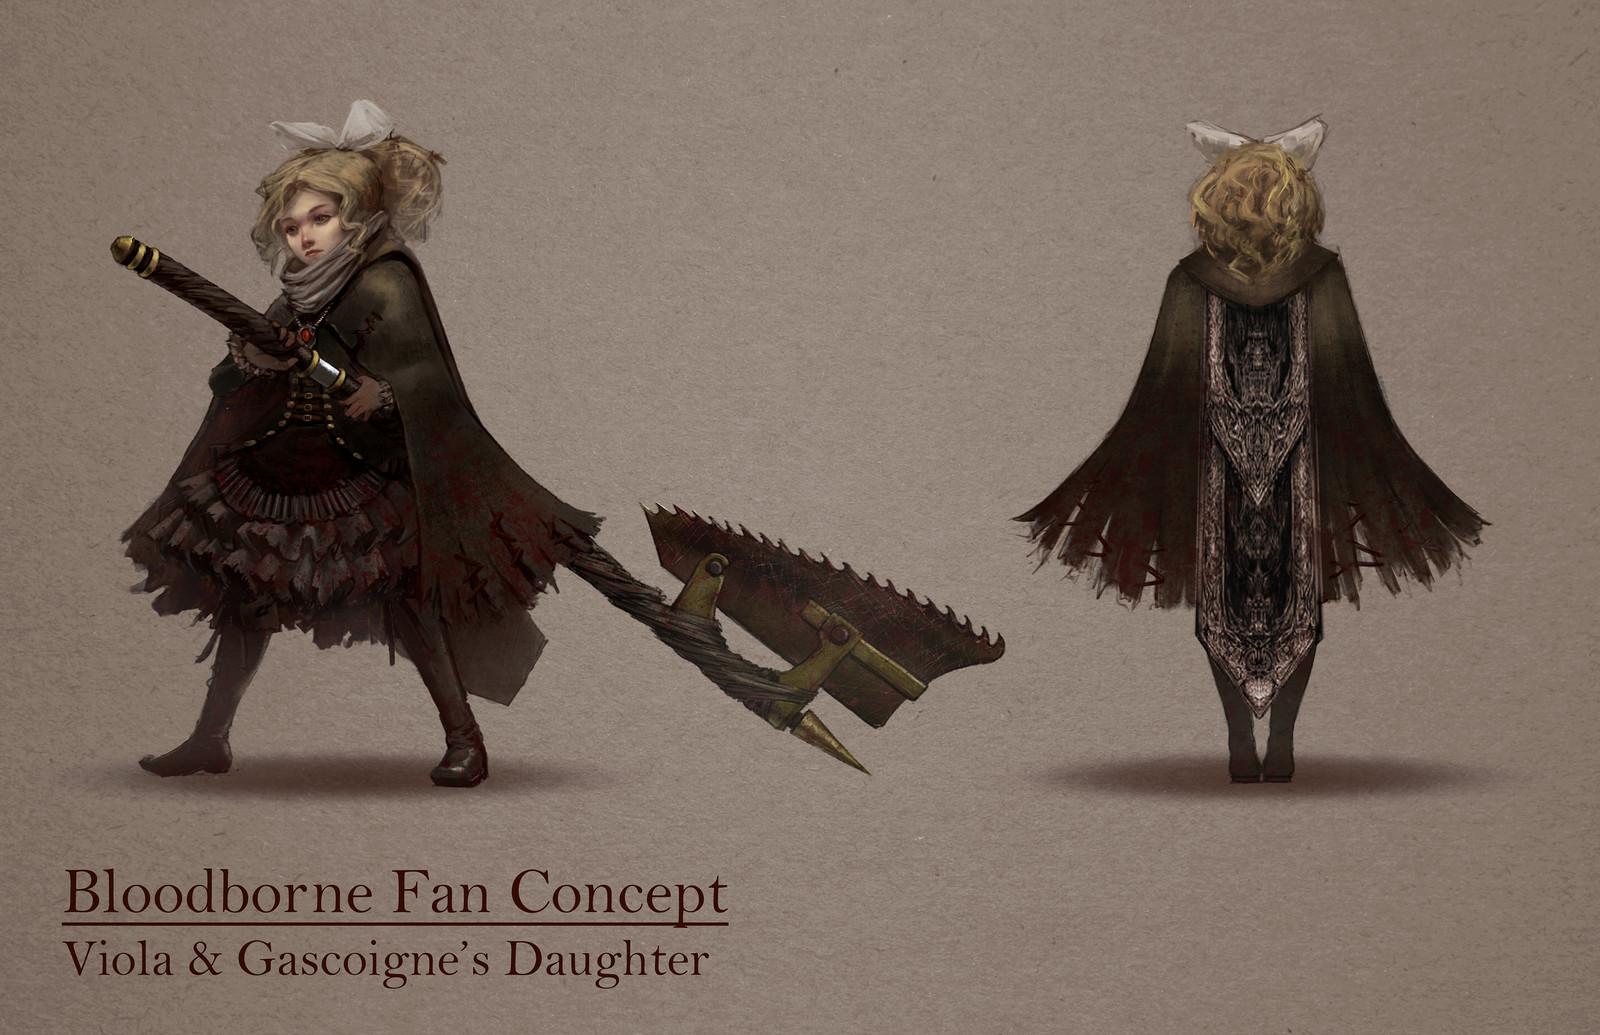 Bloodborne Fan Concept: Viola & Gascoigne's Daughter